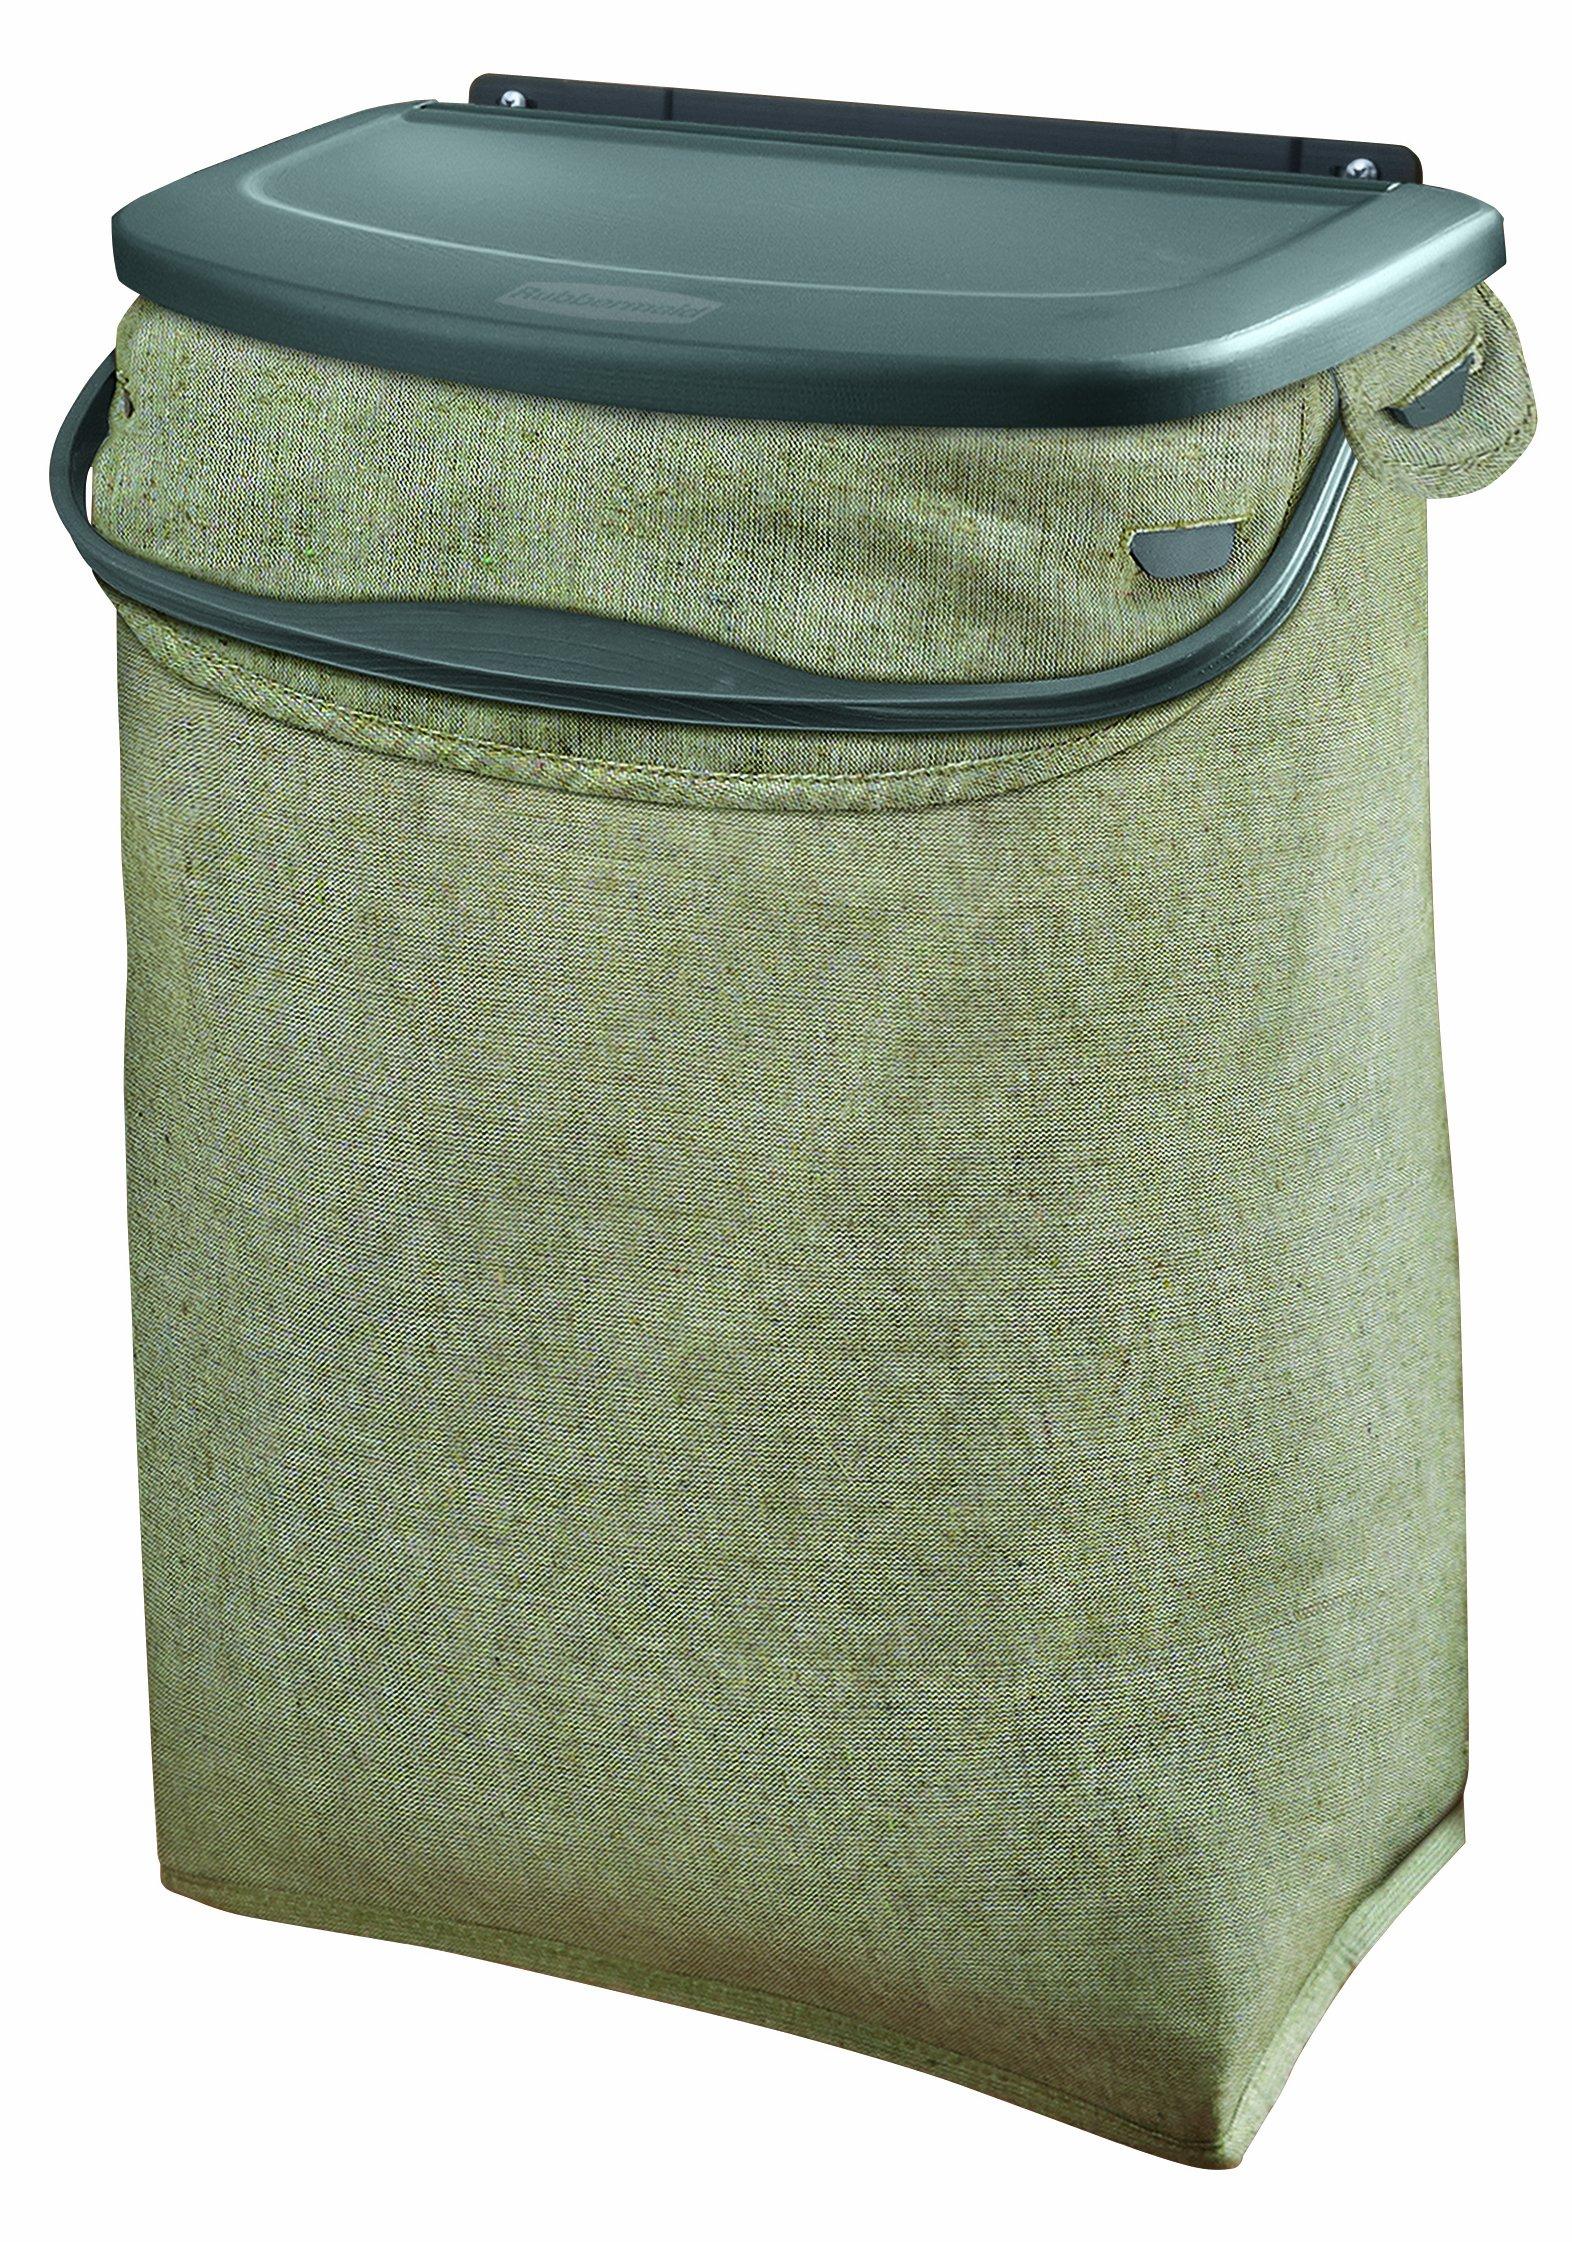 Rubbermaid 1799571 Hidden Recycler by Rubbermaid